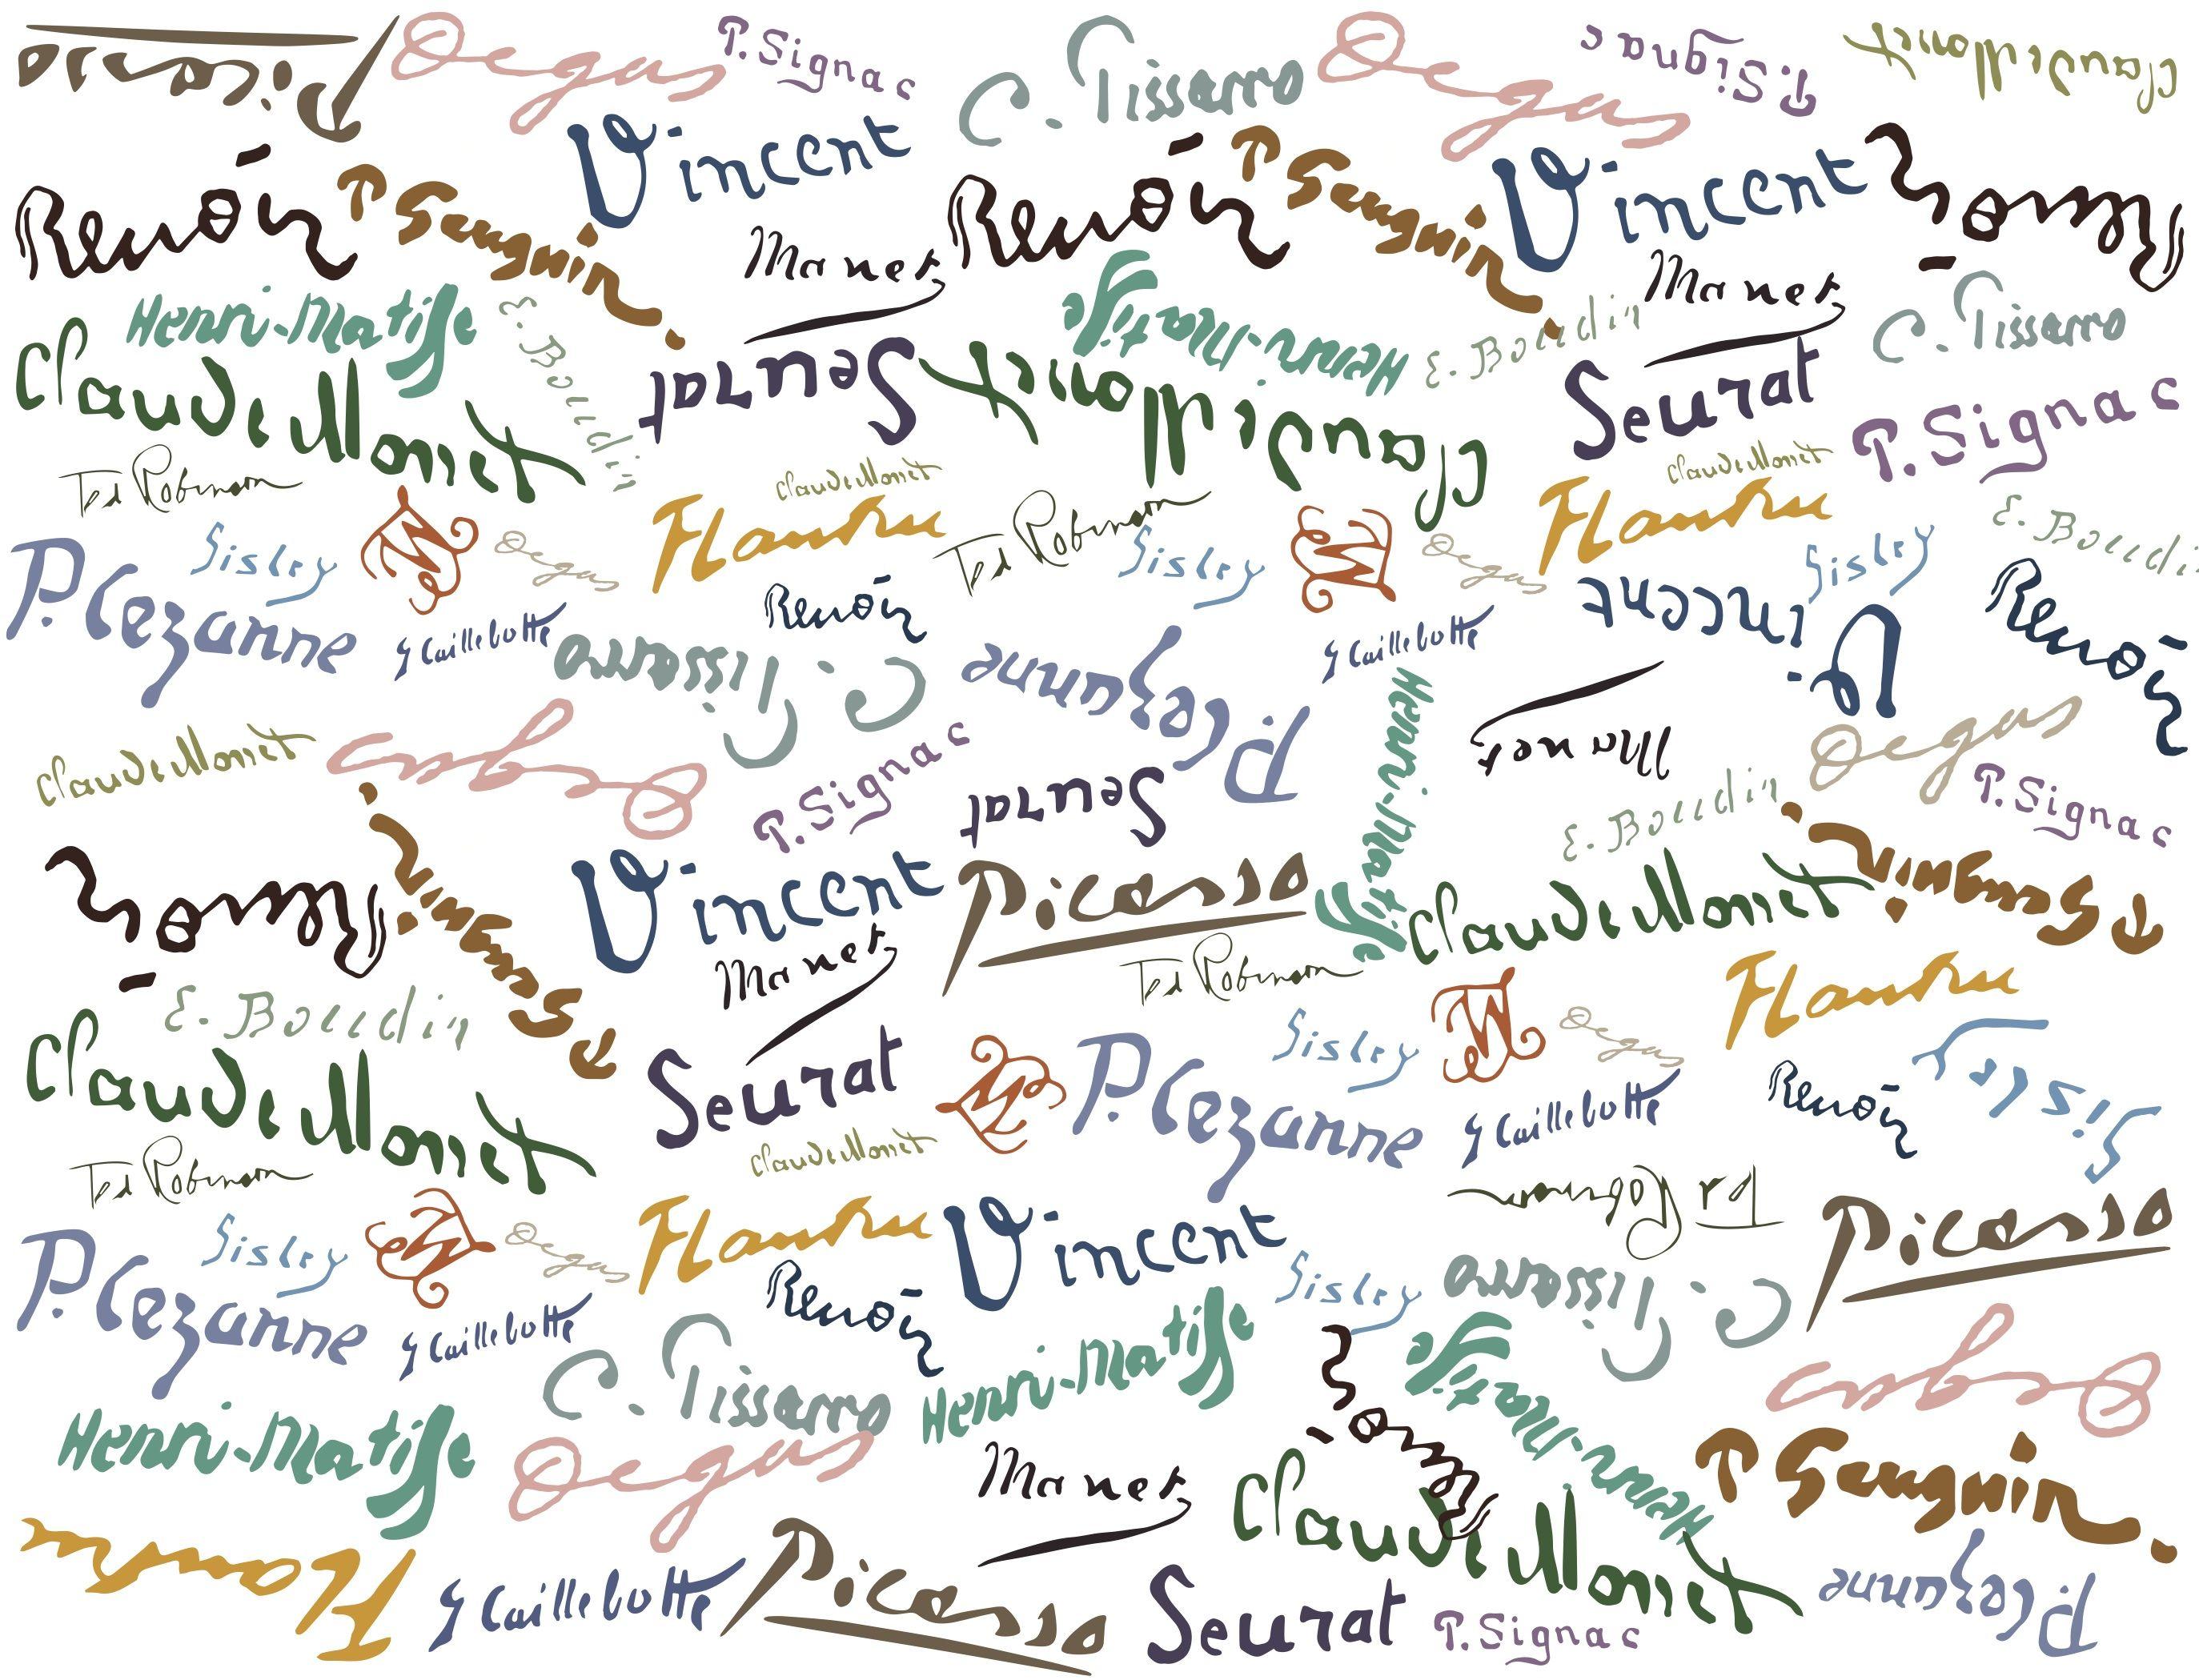 Firmas De Pintores Famosos 2747 2099 Pintoras Famosas